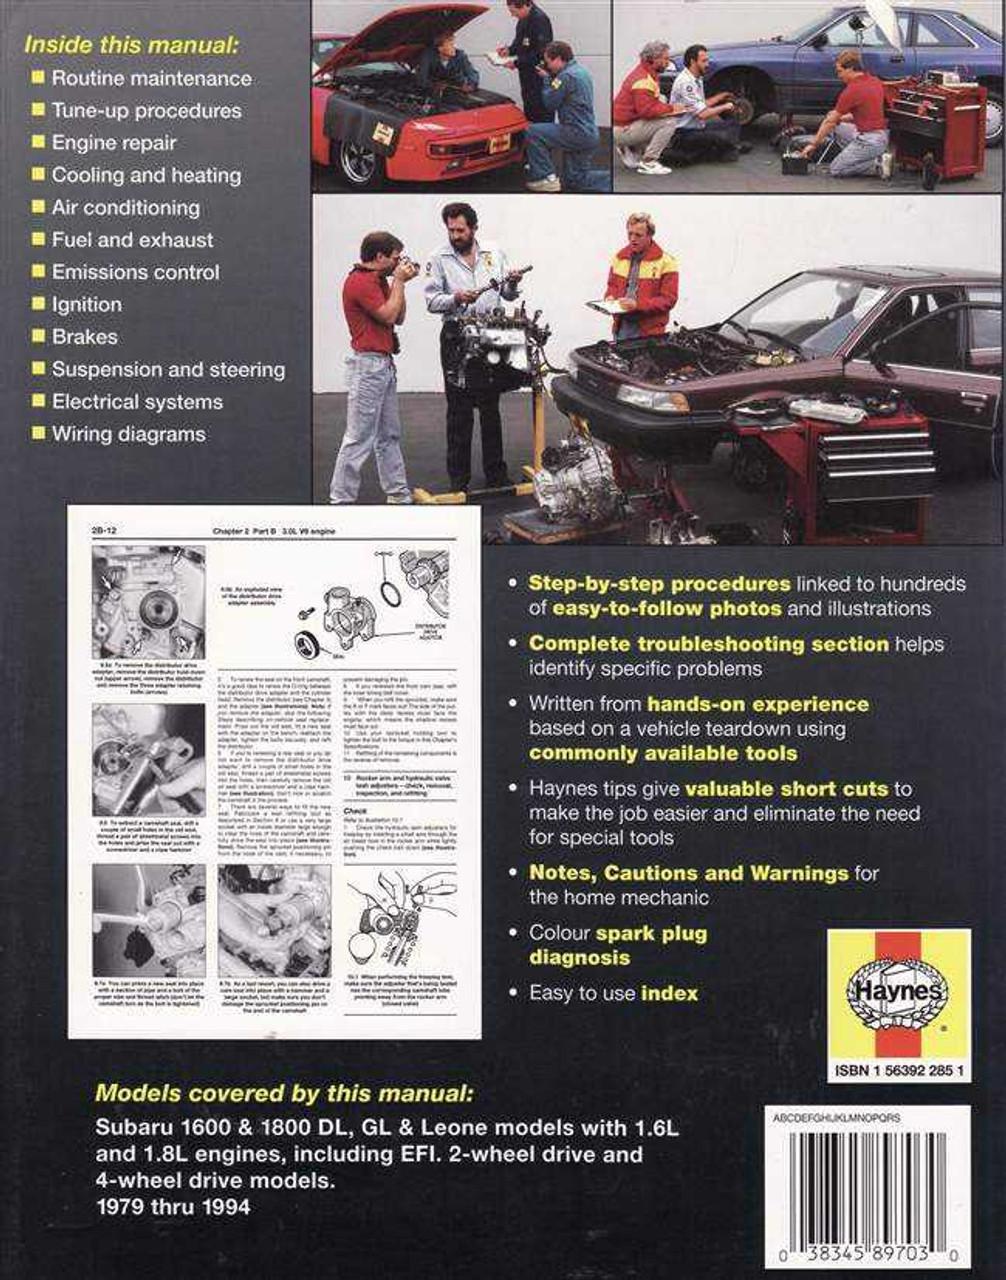 https://www automotobookshop com au/subaru-1600-and-1800-dl-gl-leone-models-1979-1994-workshop-manual/